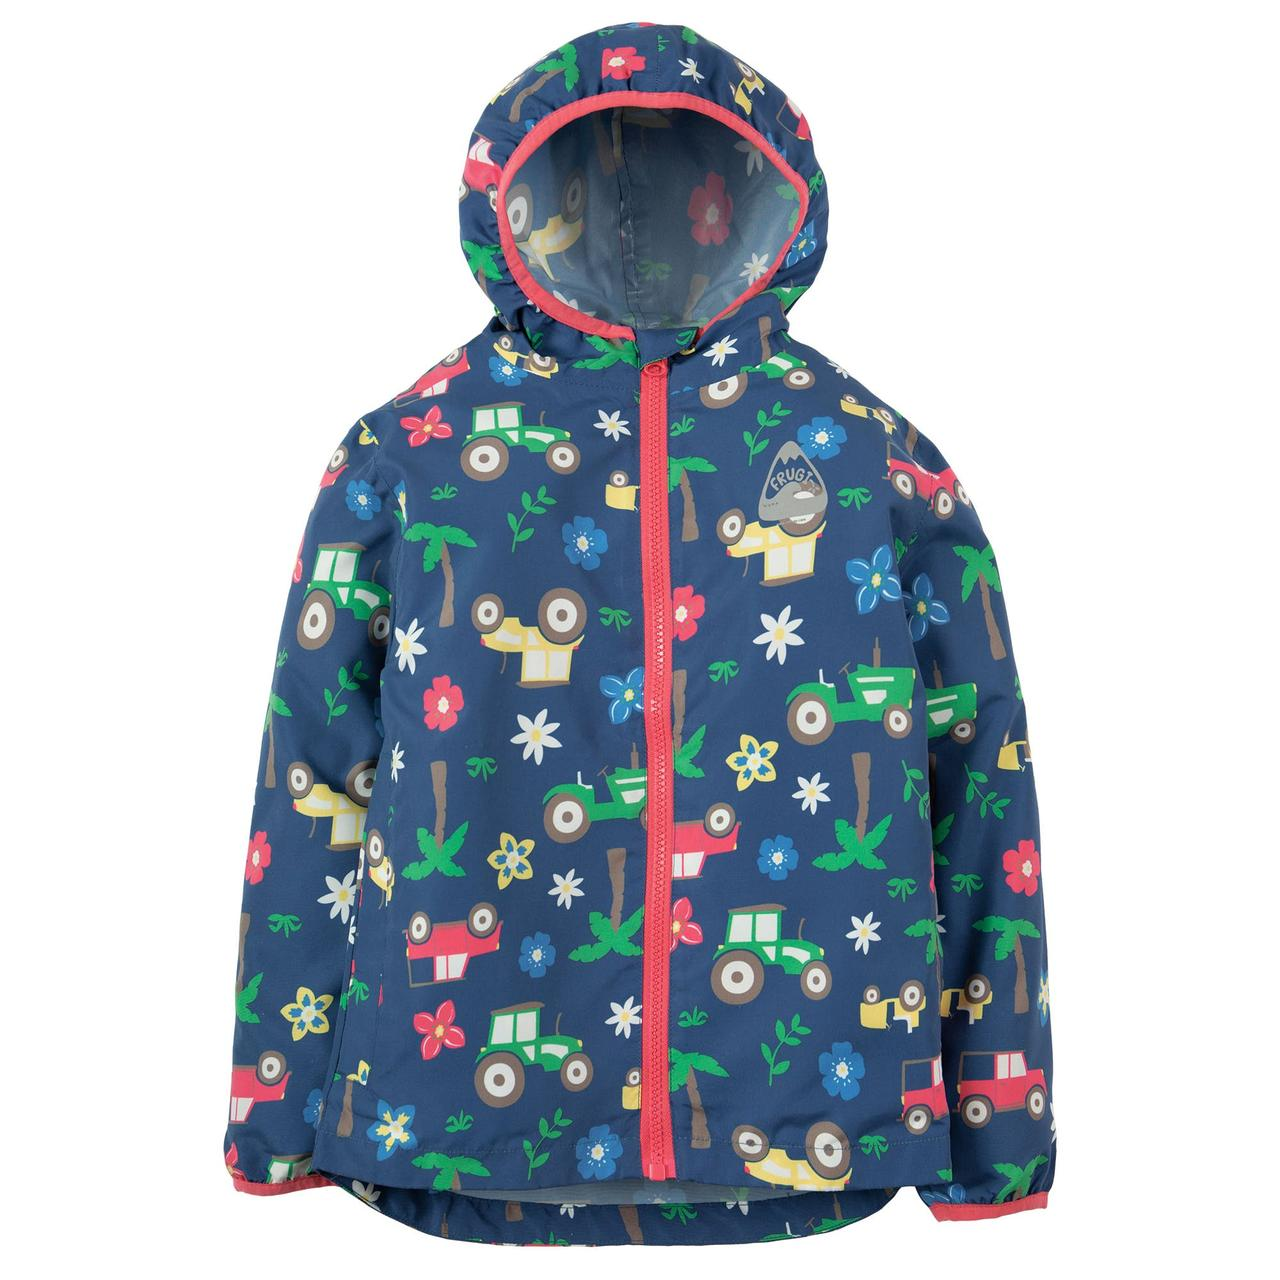 Куртка Frugi, Puddle Buster, темносиний, фото 1